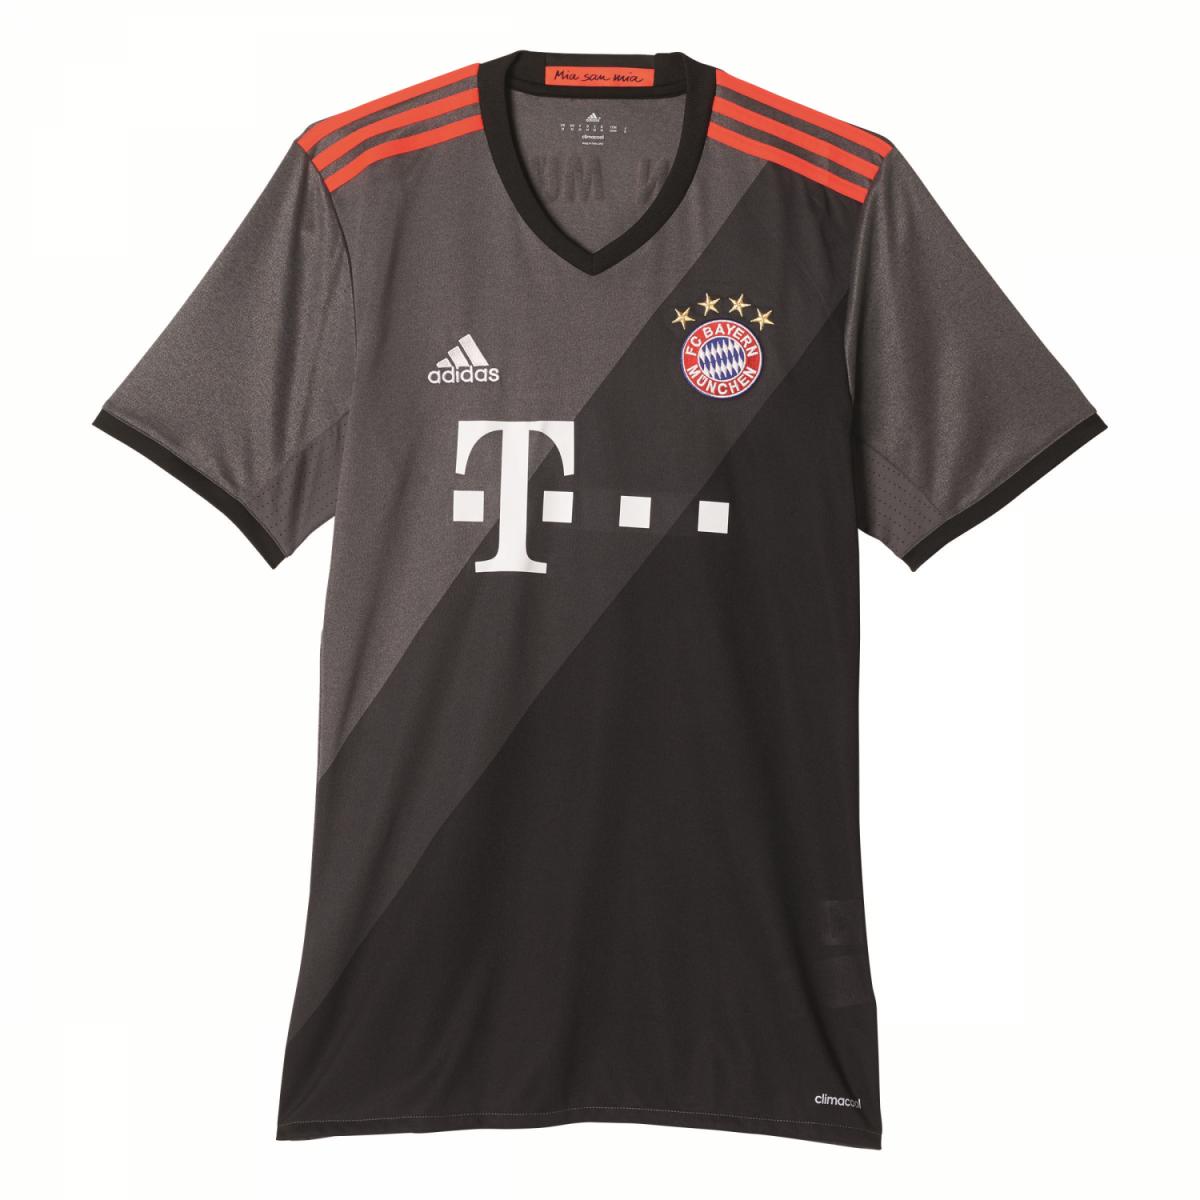 adidas FC Bayern München Away Trikot Herren 2016/2017 grau